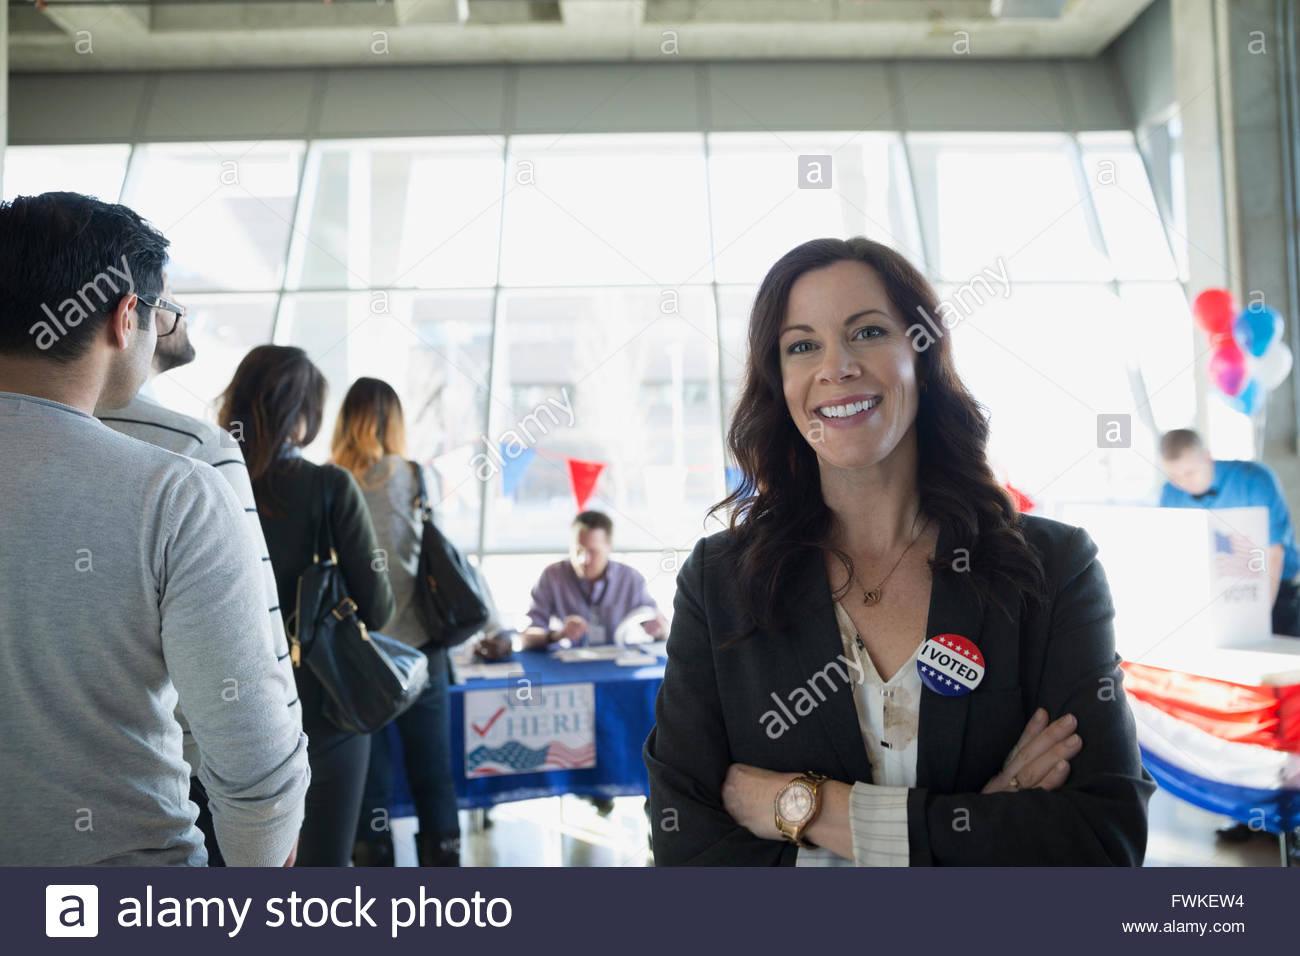 Portrait confident smiling woman at voter polling place - Stock Image